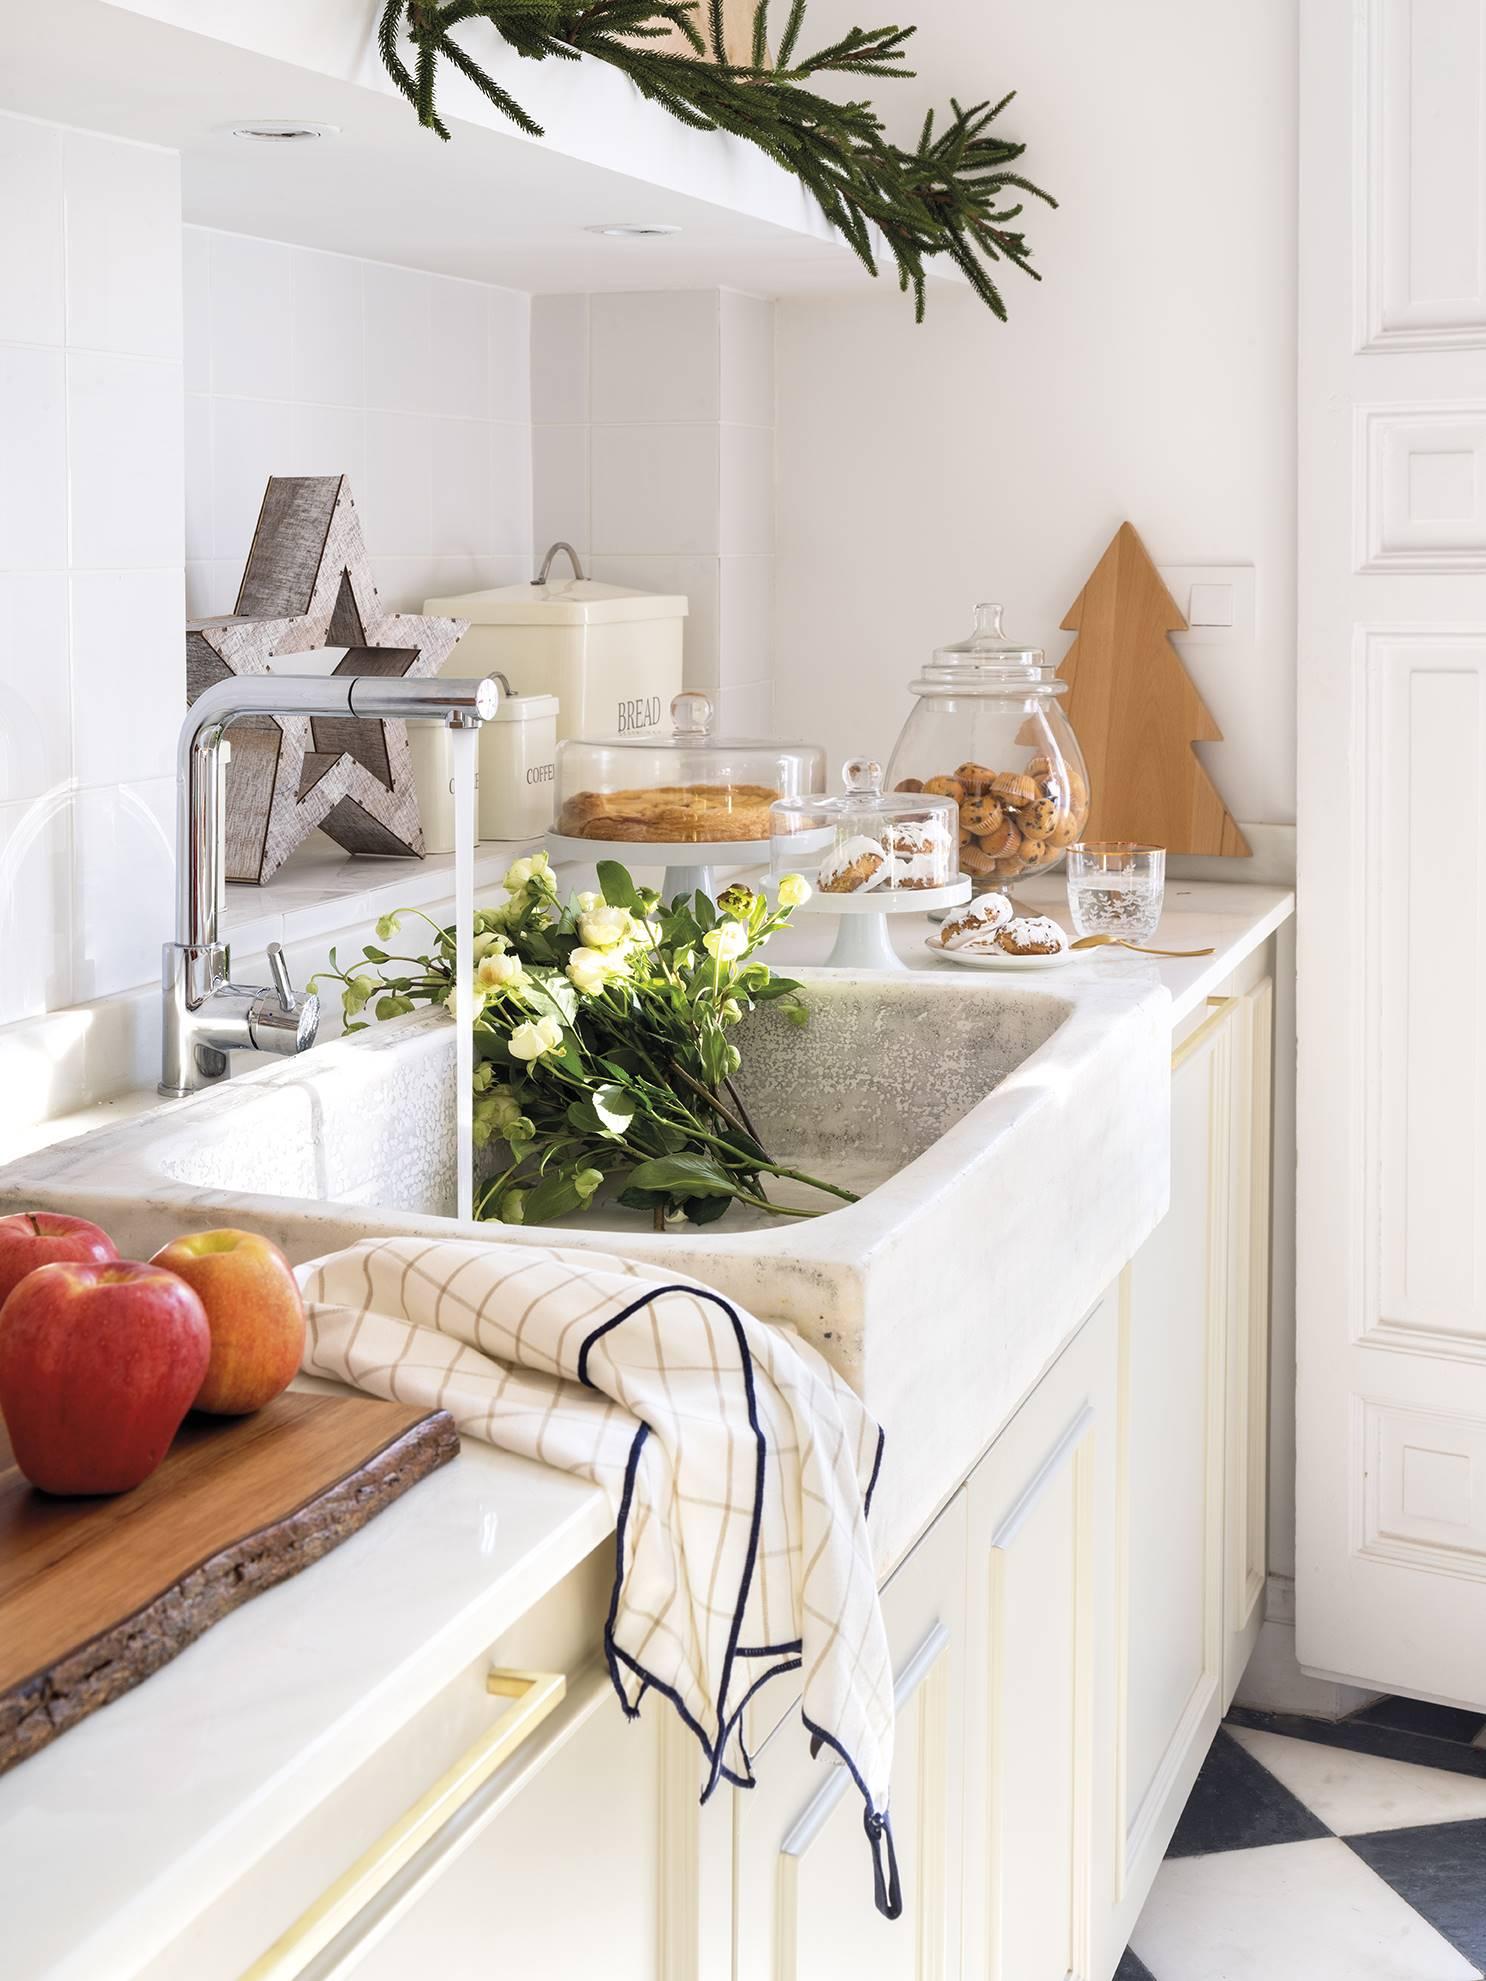 новогодний декор на кухонной столешнице